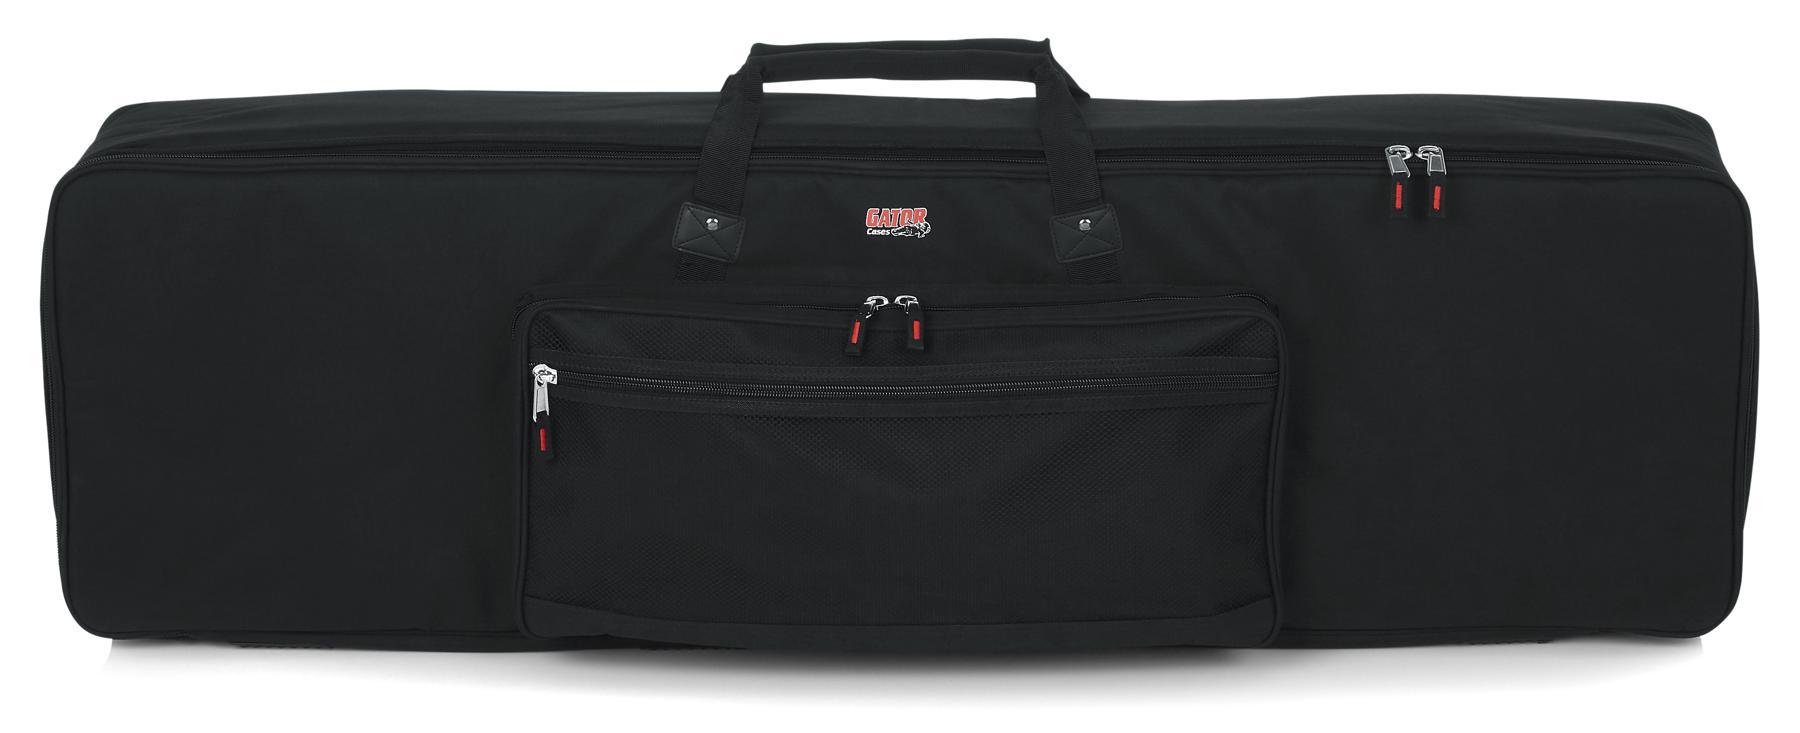 7. Gator Cases Padded Keyboard Gig Bag (GKB-88 SLIM)